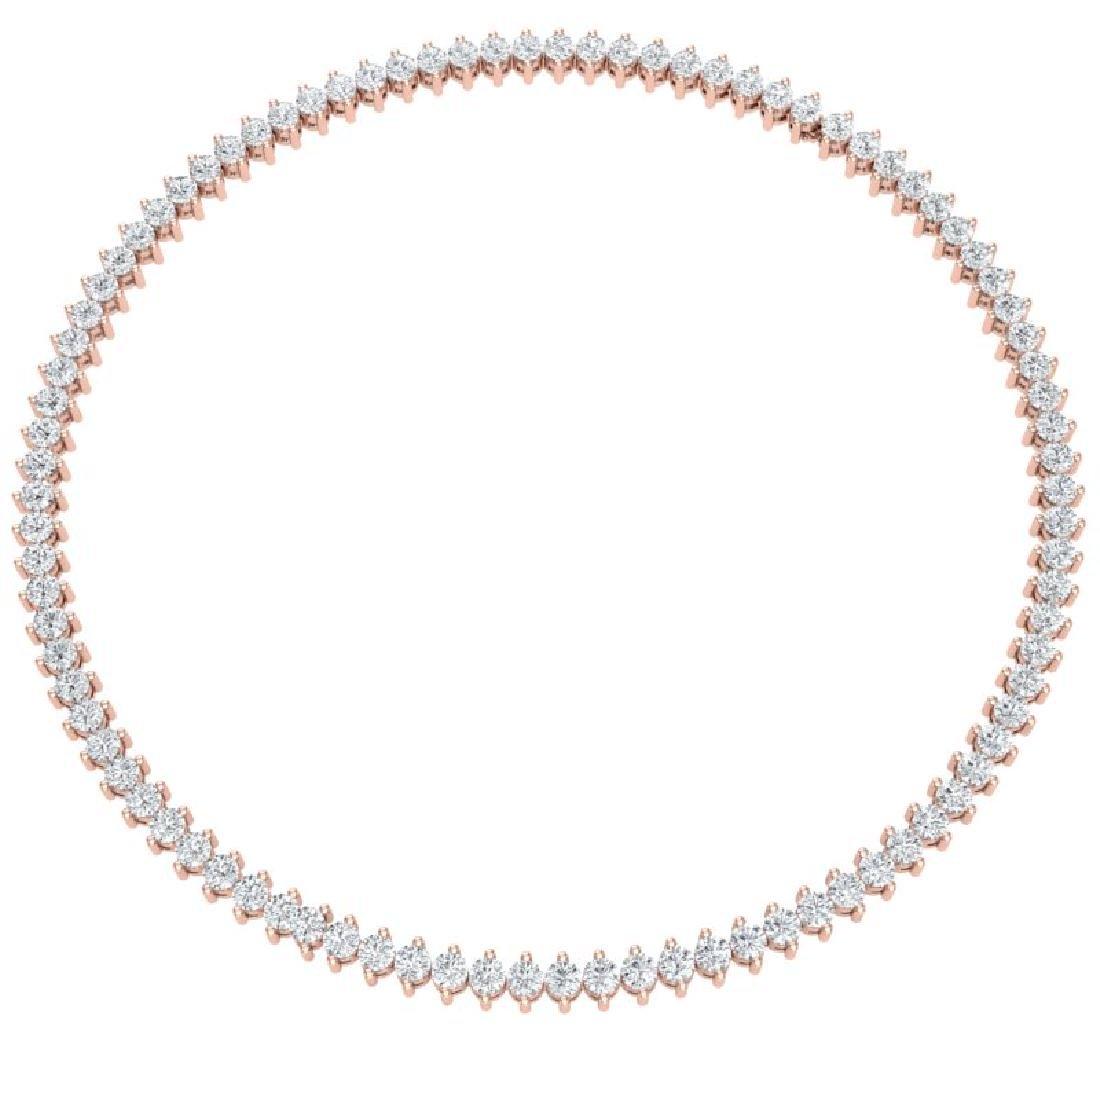 20 CTW Certified VS/SI Diamond Necklace 18K Rose Gold - 3